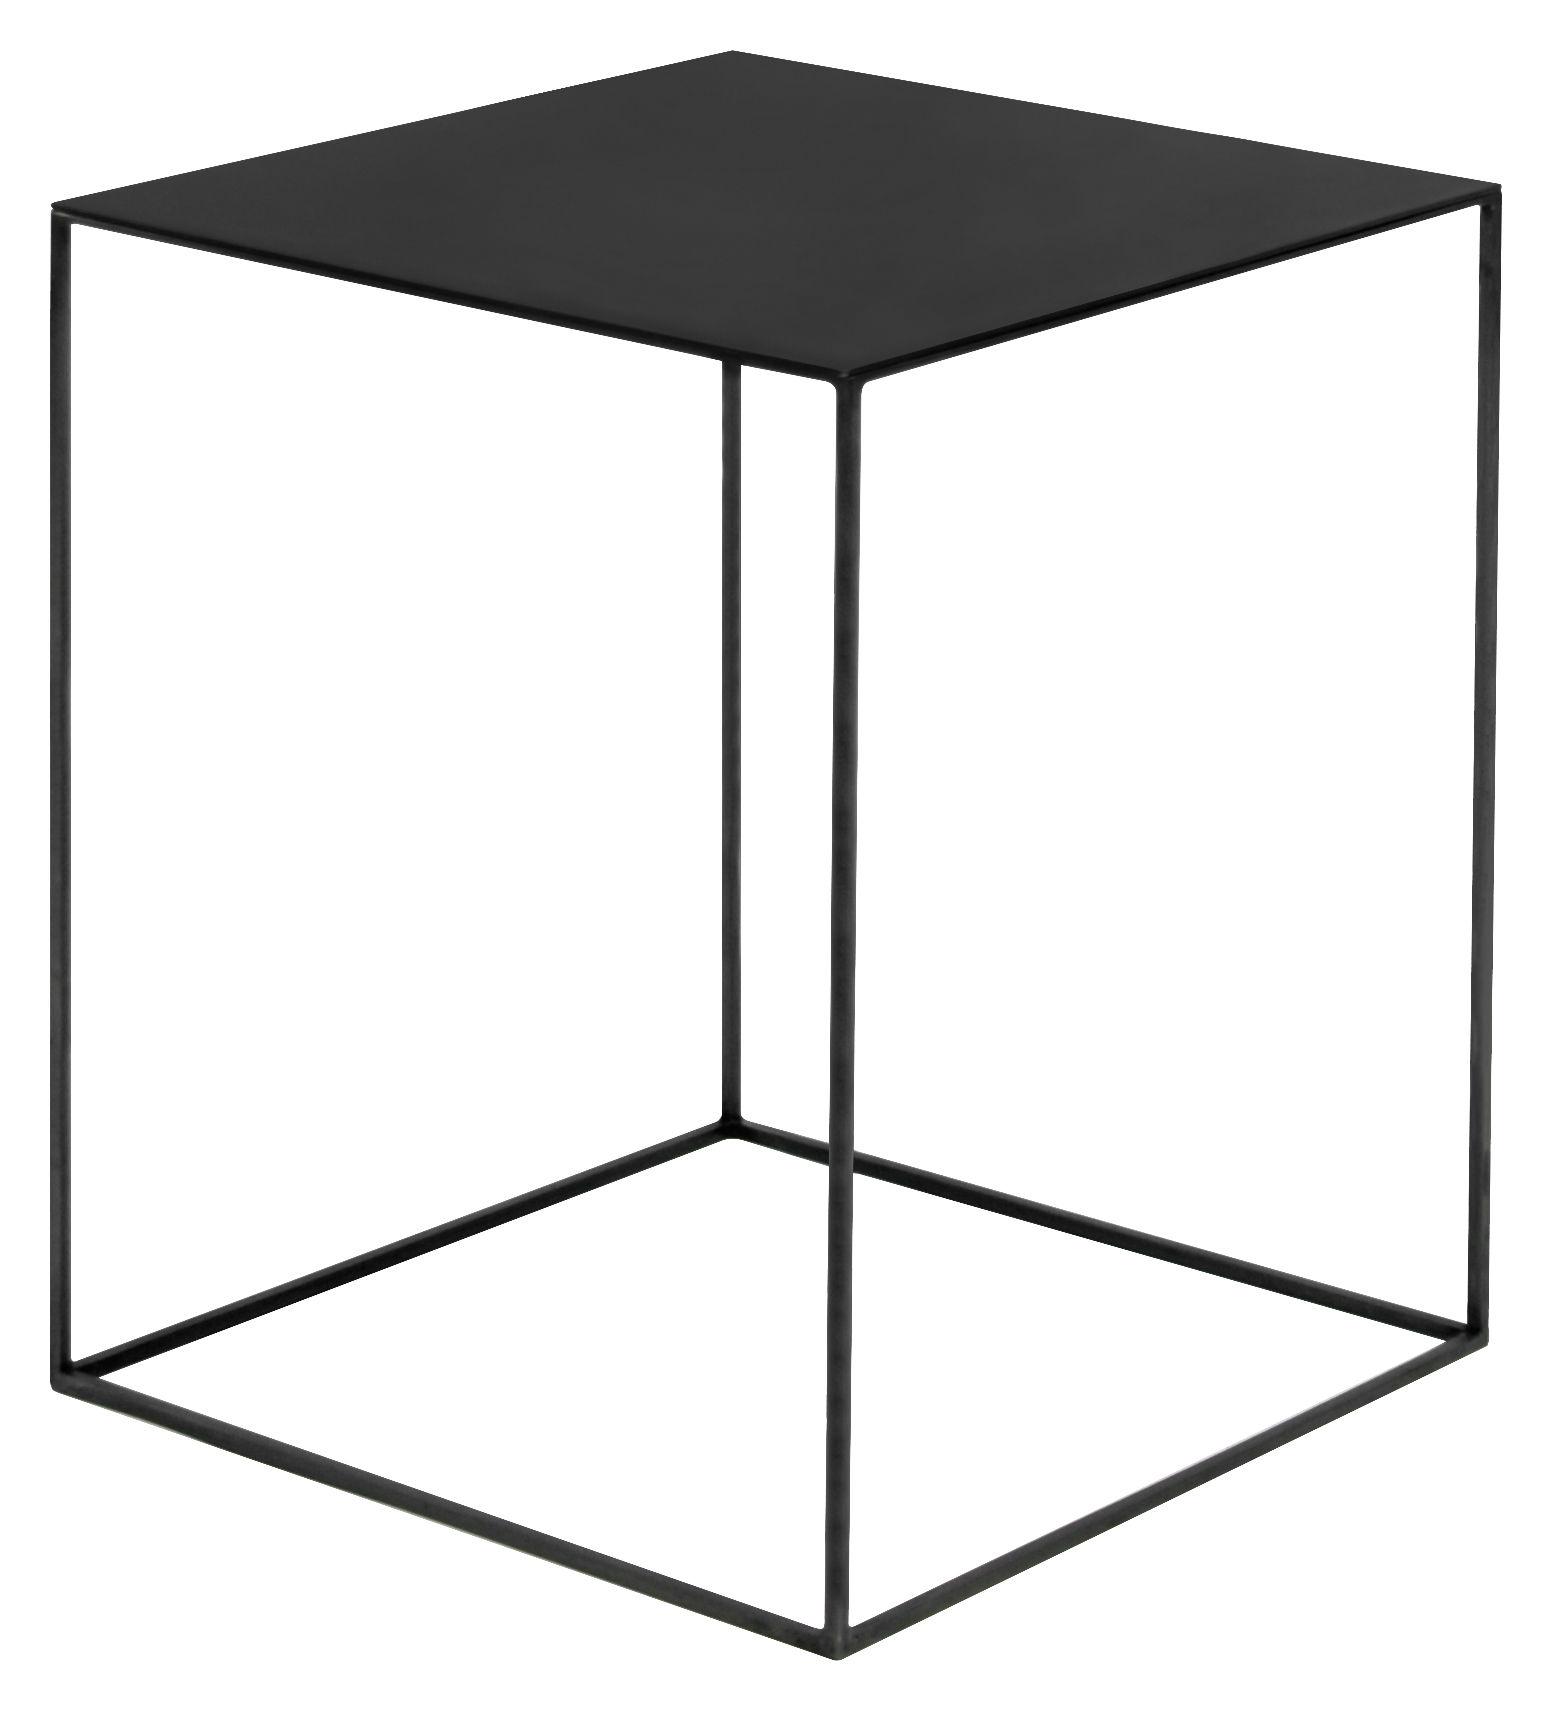 Arredamento - Tavolini  - Tavolino Slim Irony - / 41 x 41 x H 64 cm di Zeus - Top nero fostatato / Base nera ramata - Acciaio